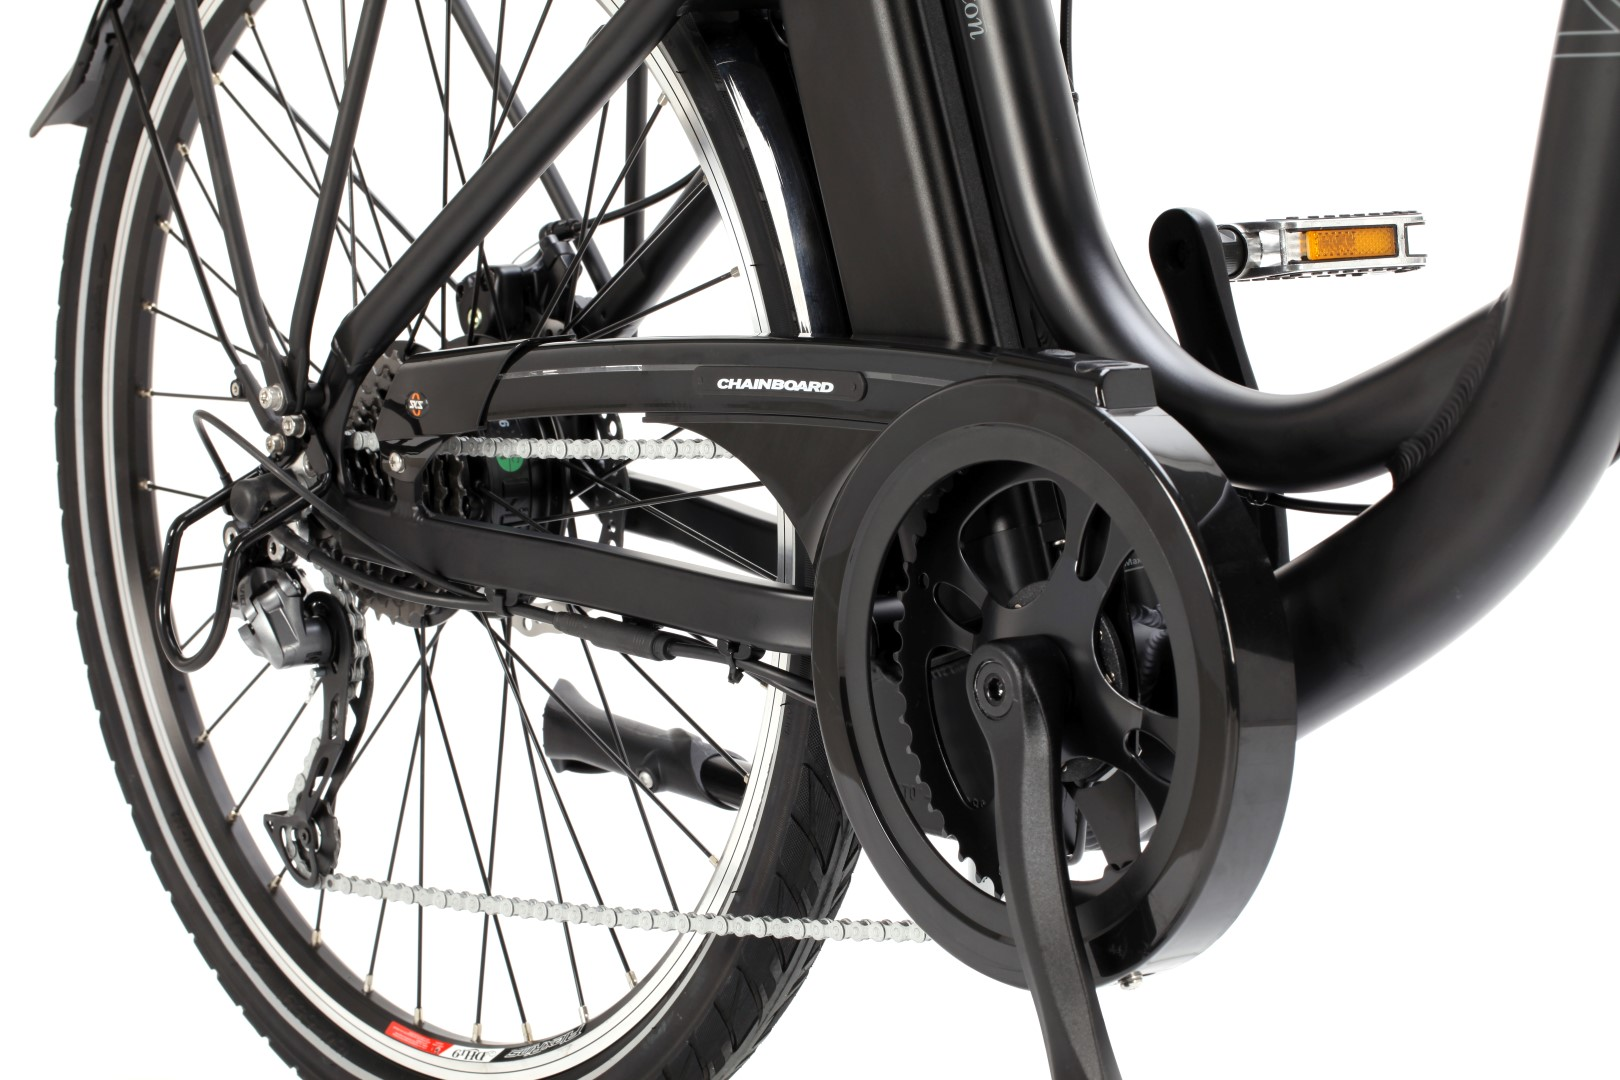 bf88c86284b burlington-step-through-classic-electric-bicycle-chain